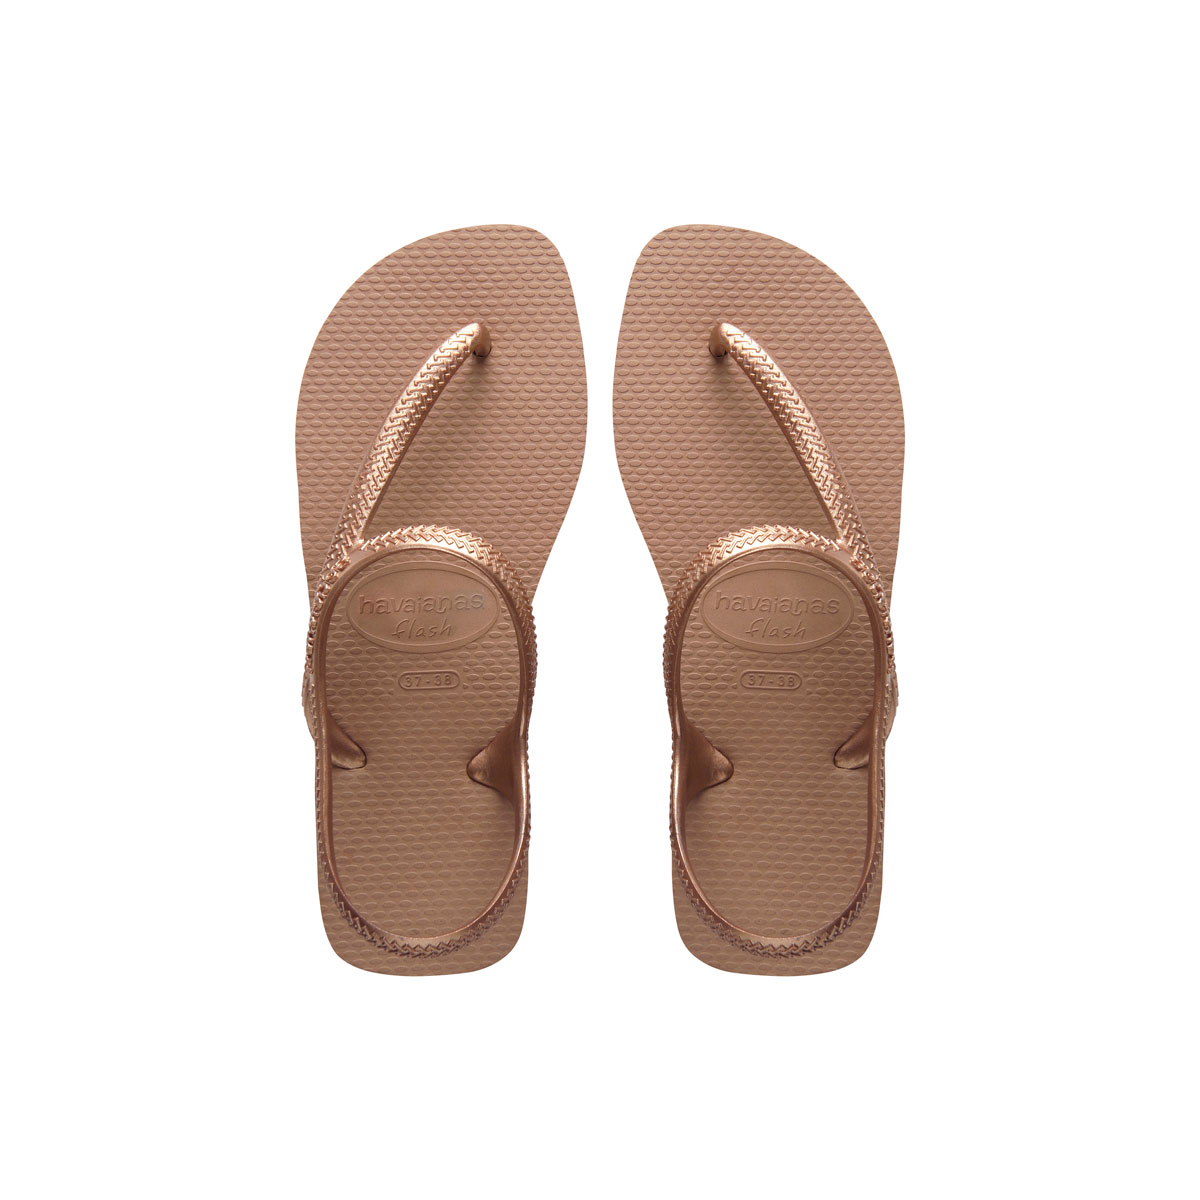 Havaianas Urban Flash Rose Gold Flip Flops Sandals Gift